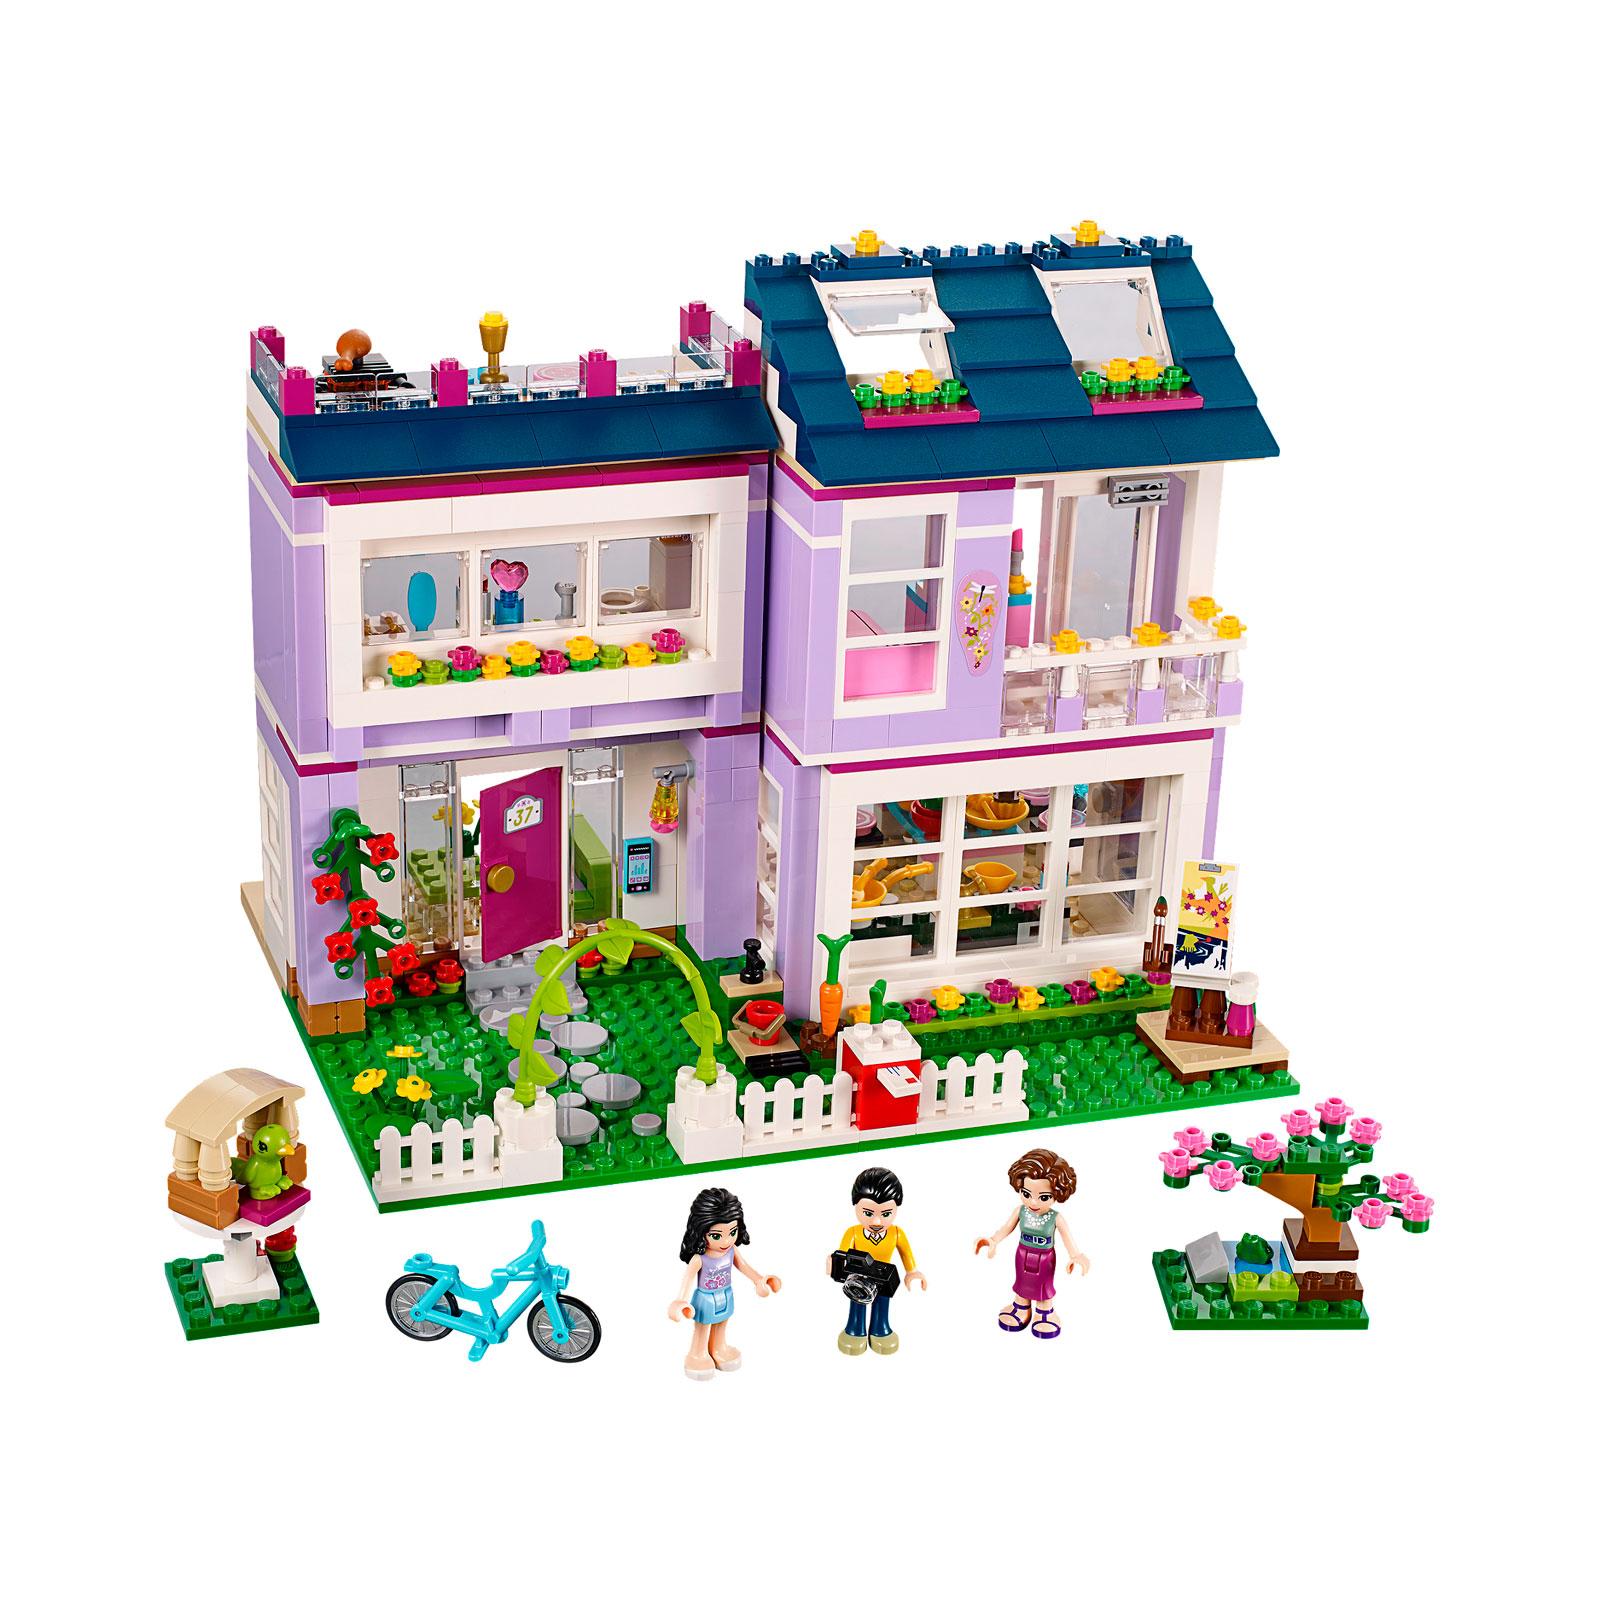 Конструктор LEGO Friends 41095 Дом Эммы<br>